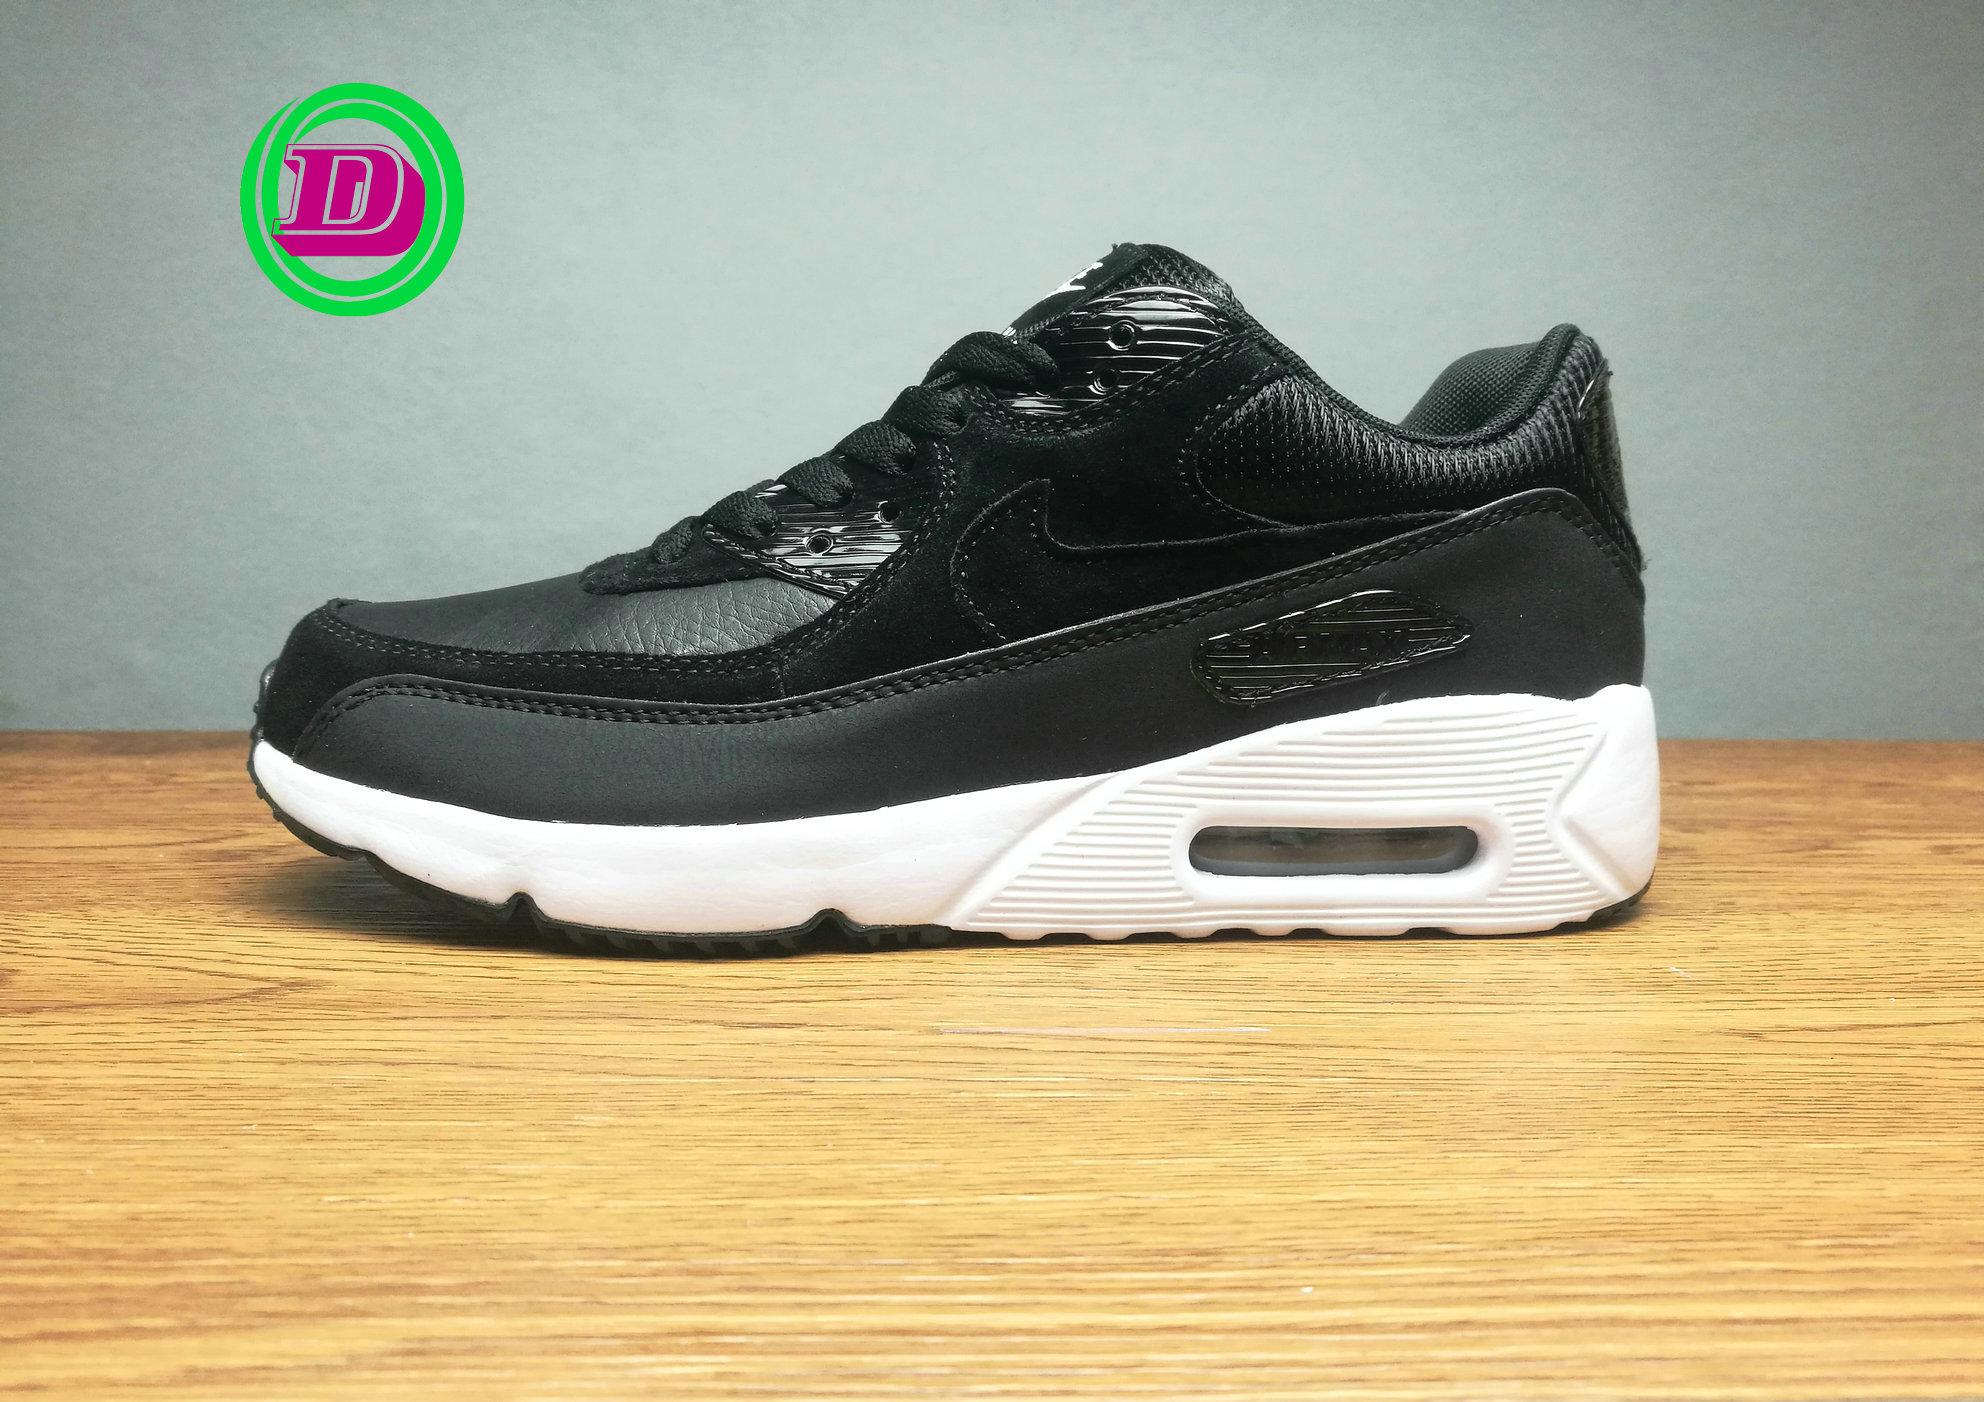 9db204433c ... shop nike air max 90 leather black. u2039 u203a 682a8 0ee8e